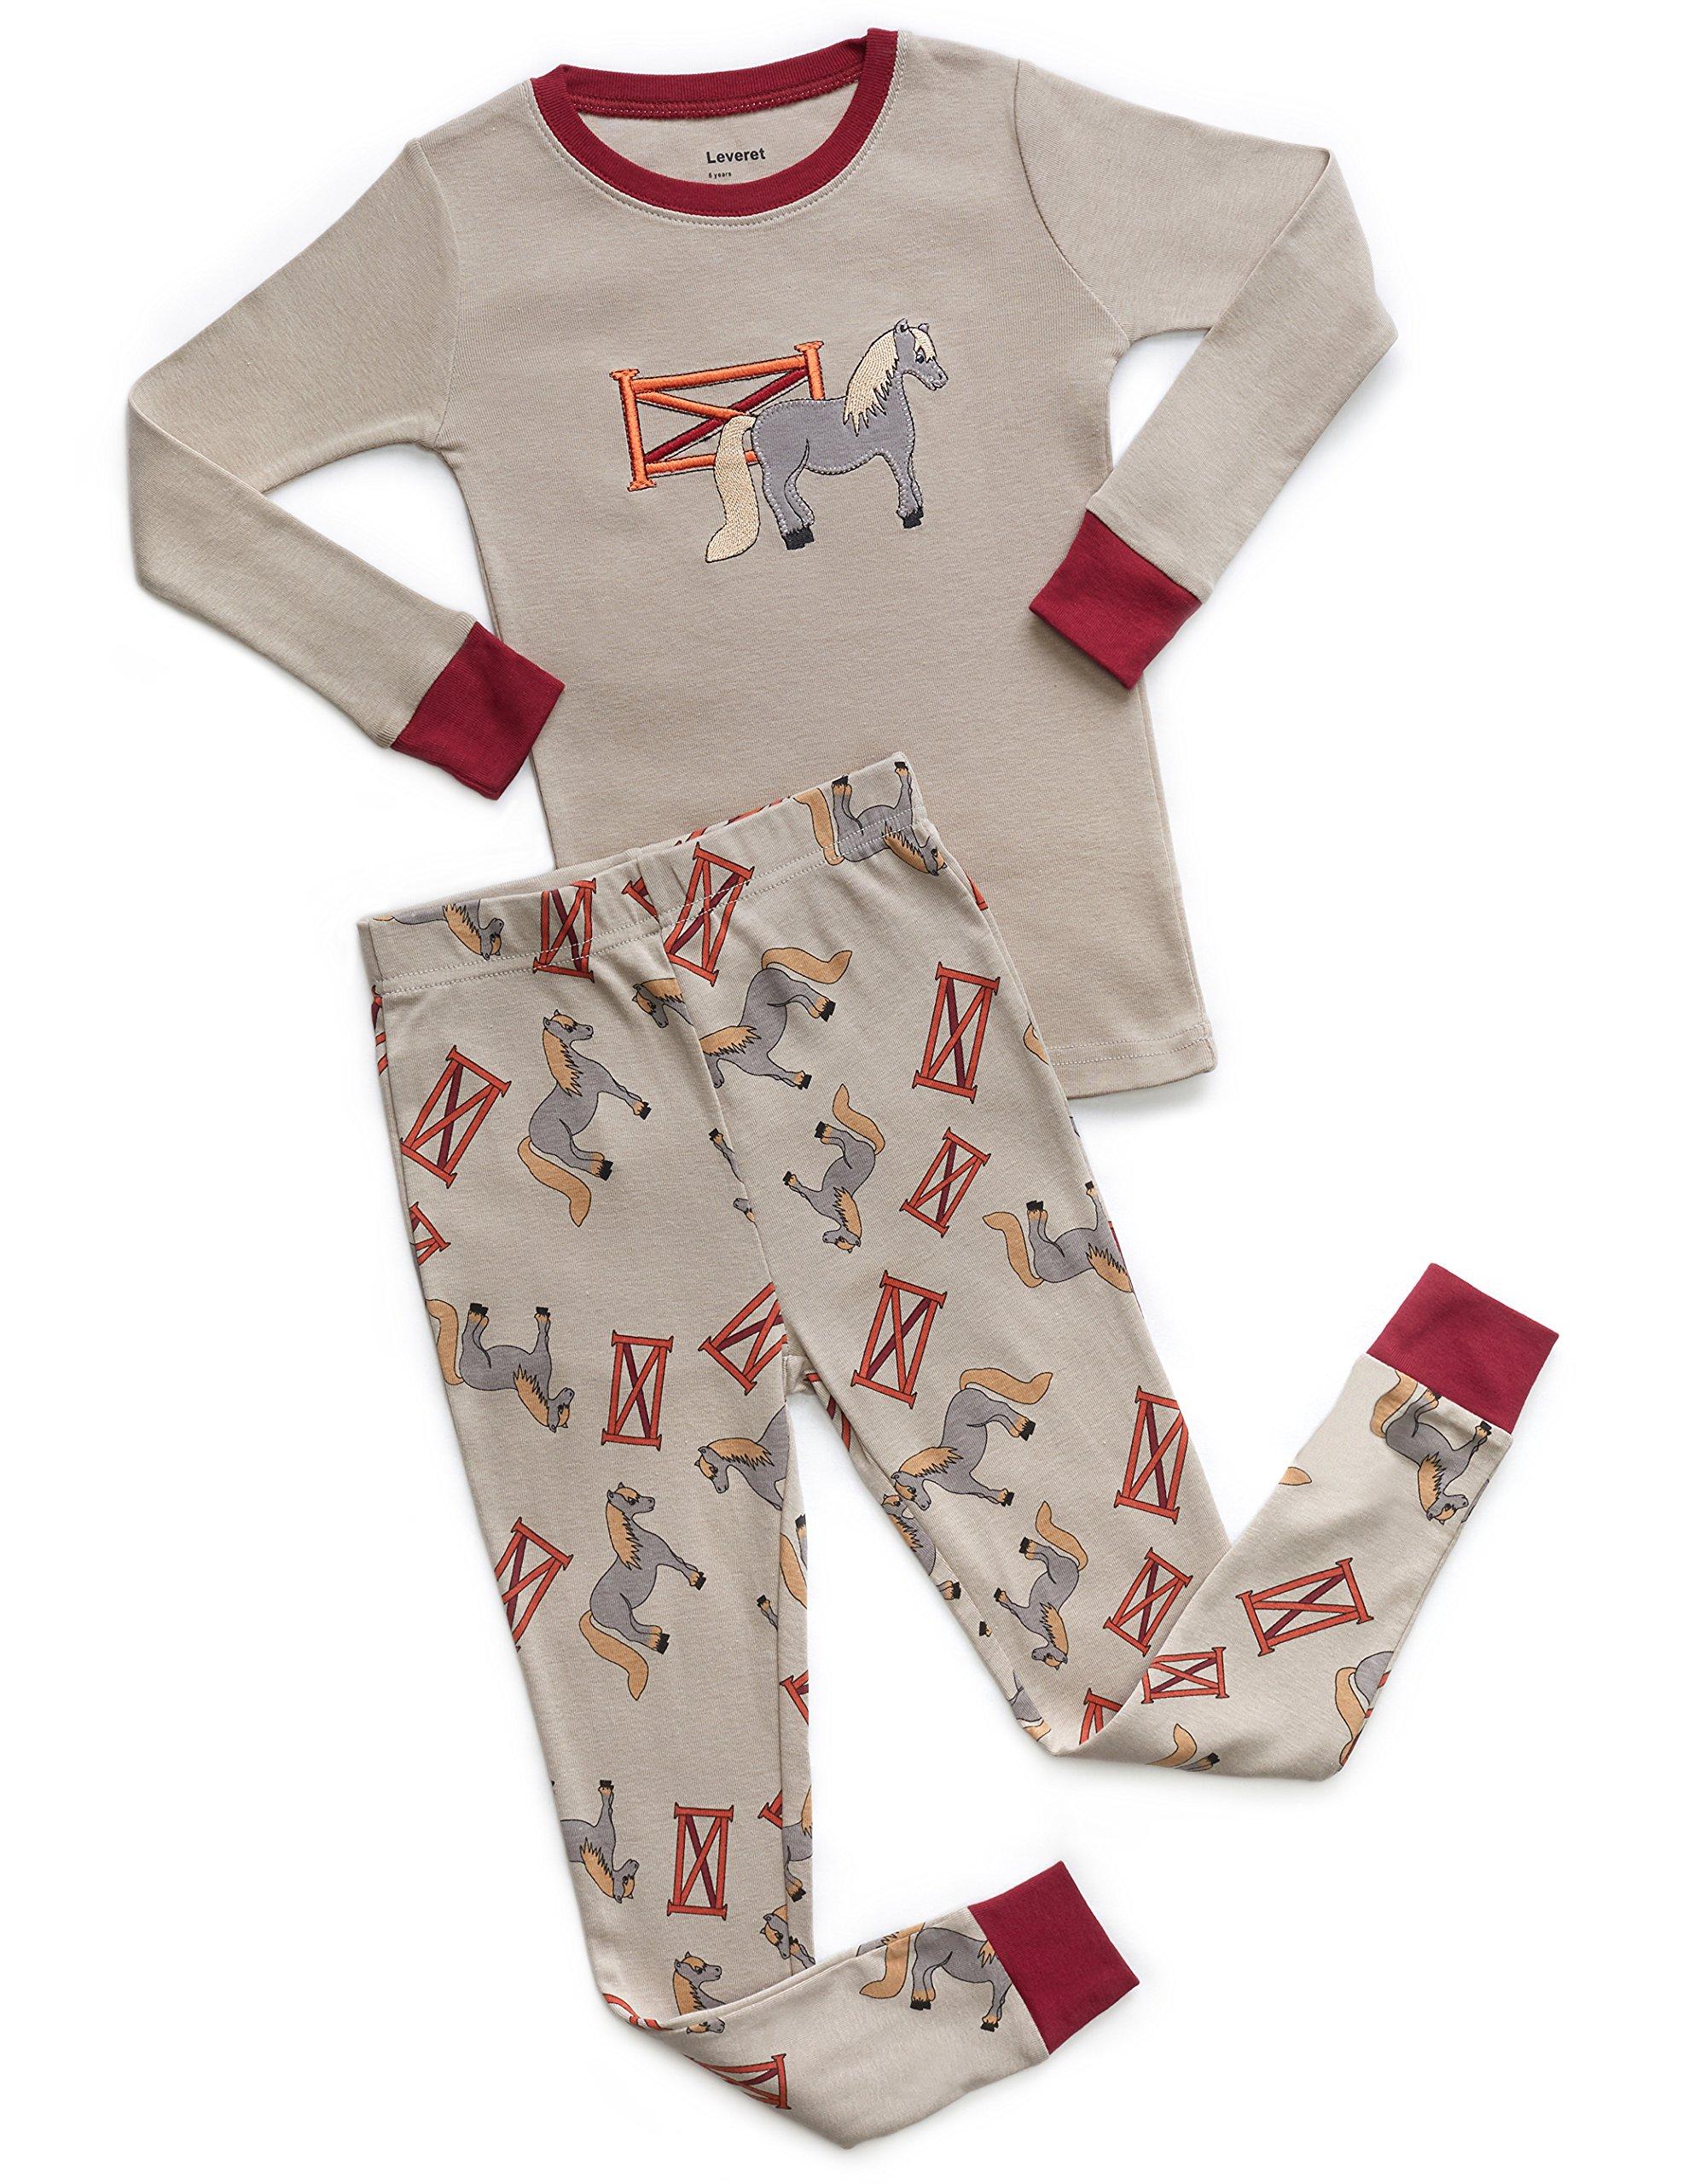 Leveret Organic Cotton Pony 2 Piece Pajama Set 12 Years